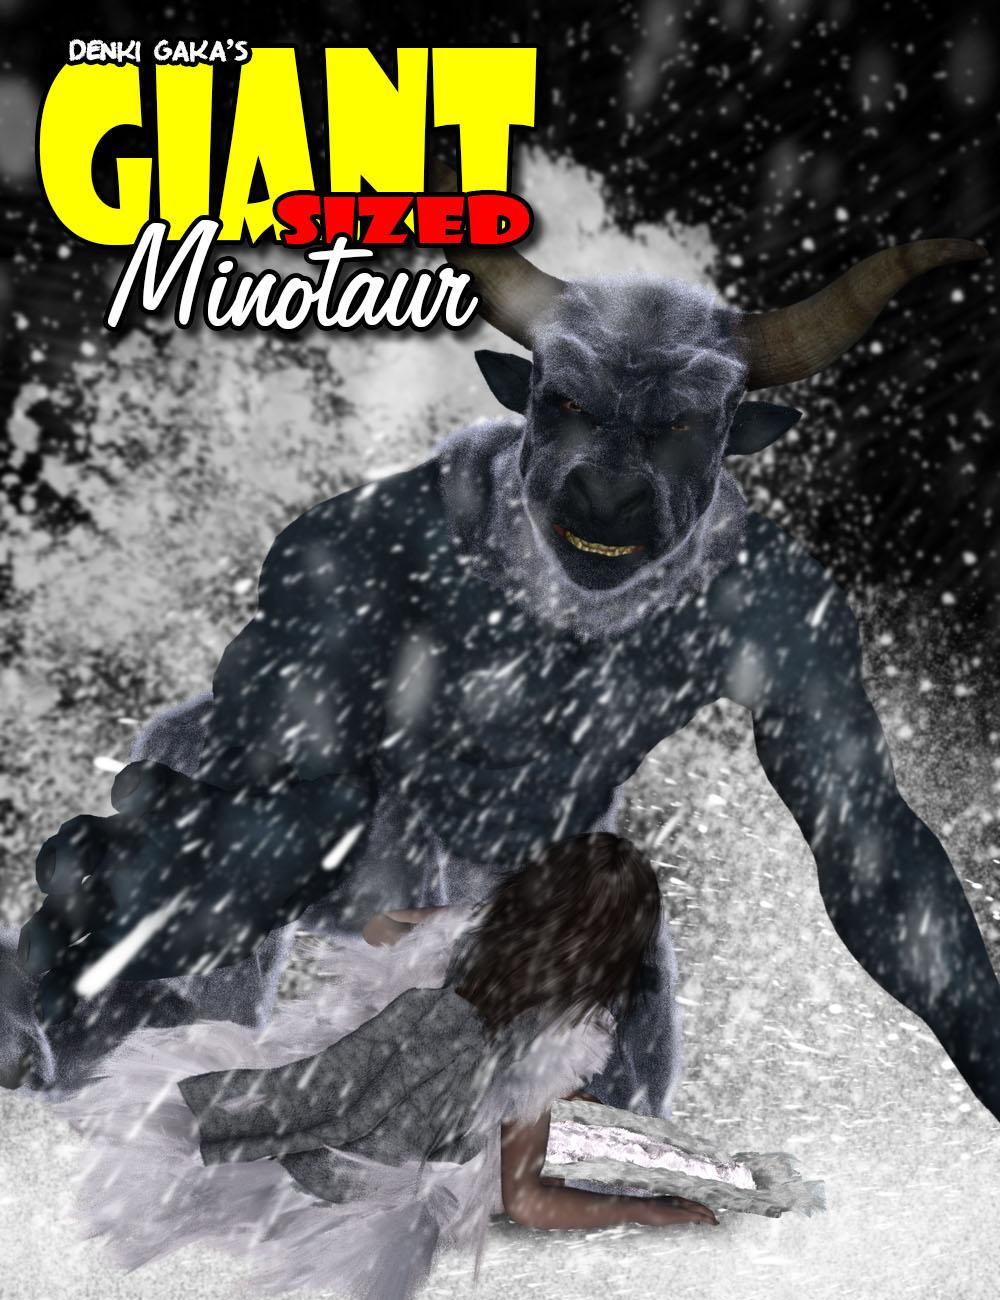 Giant Sized Minotaur 6 by: Denki Gaka, 3D Models by Daz 3D